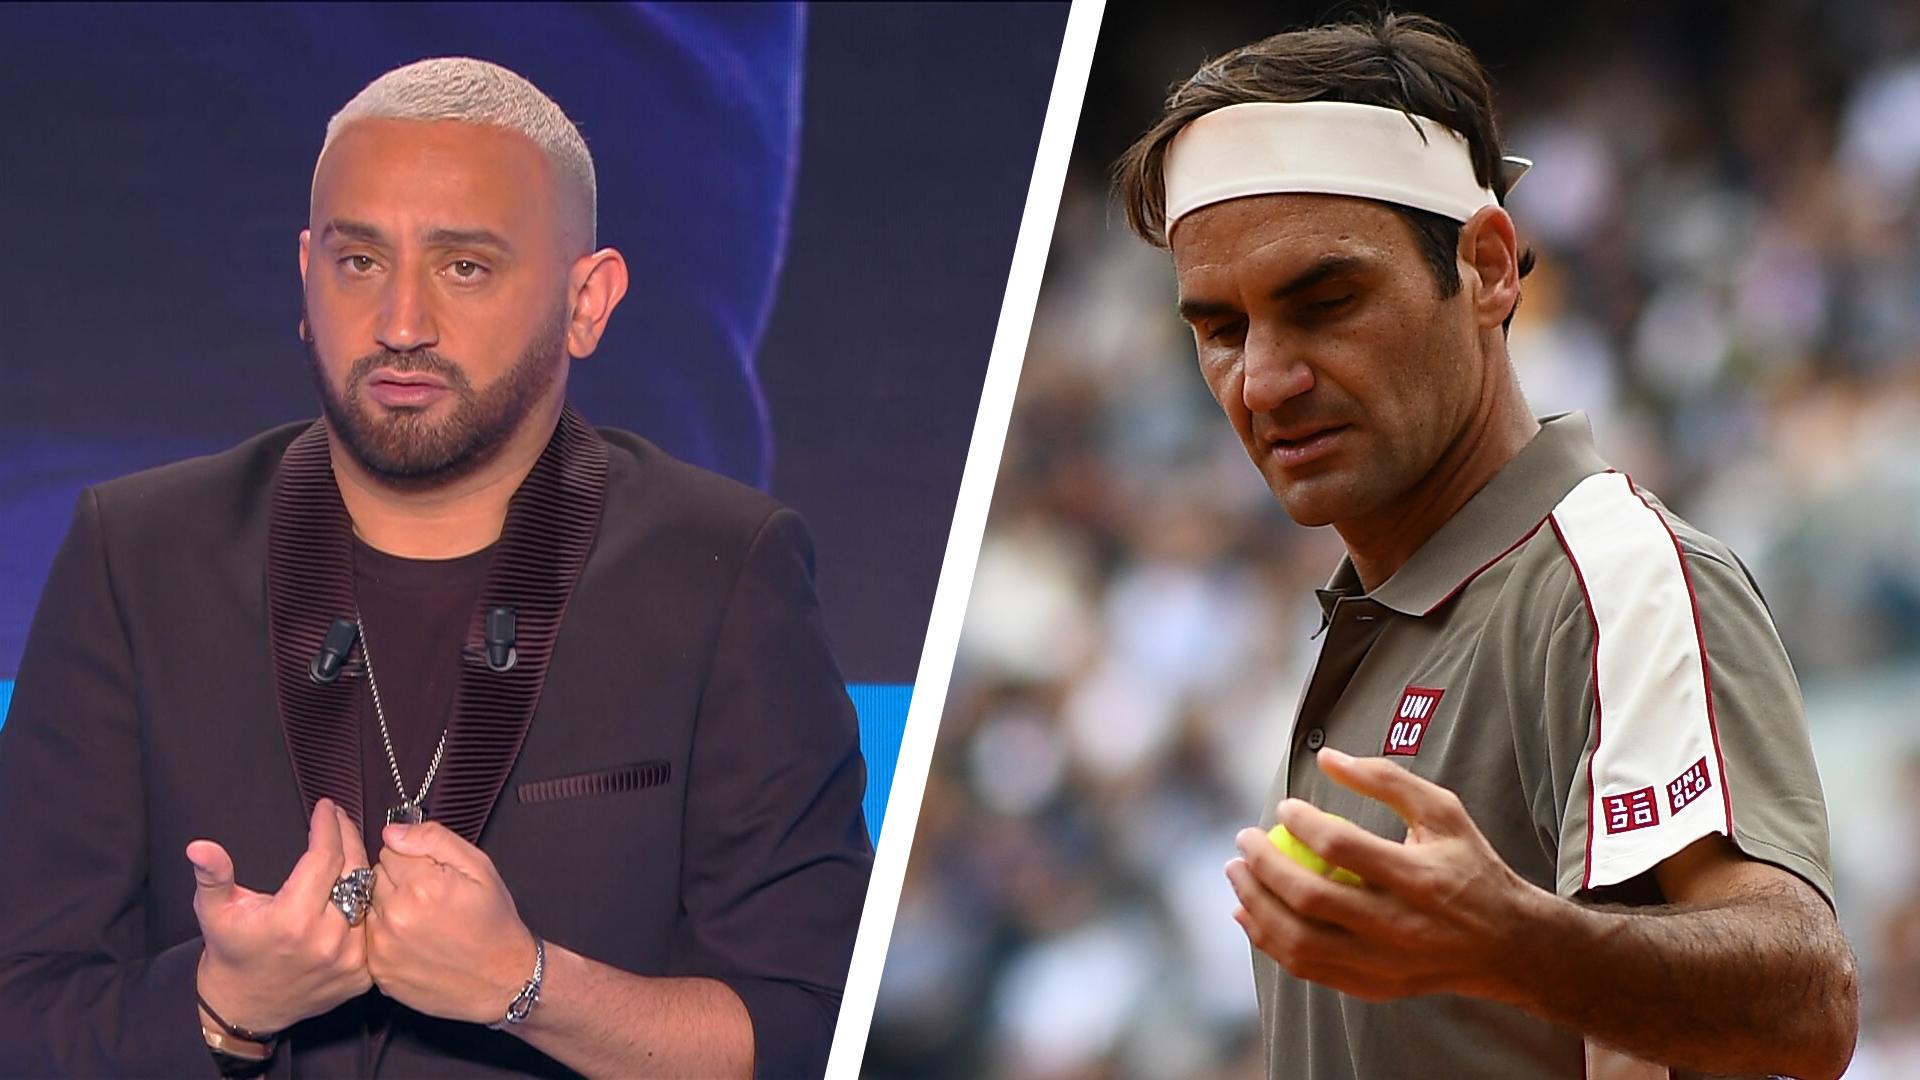 Cyril Hanouna provoque Roger Federer dans un restaurant: